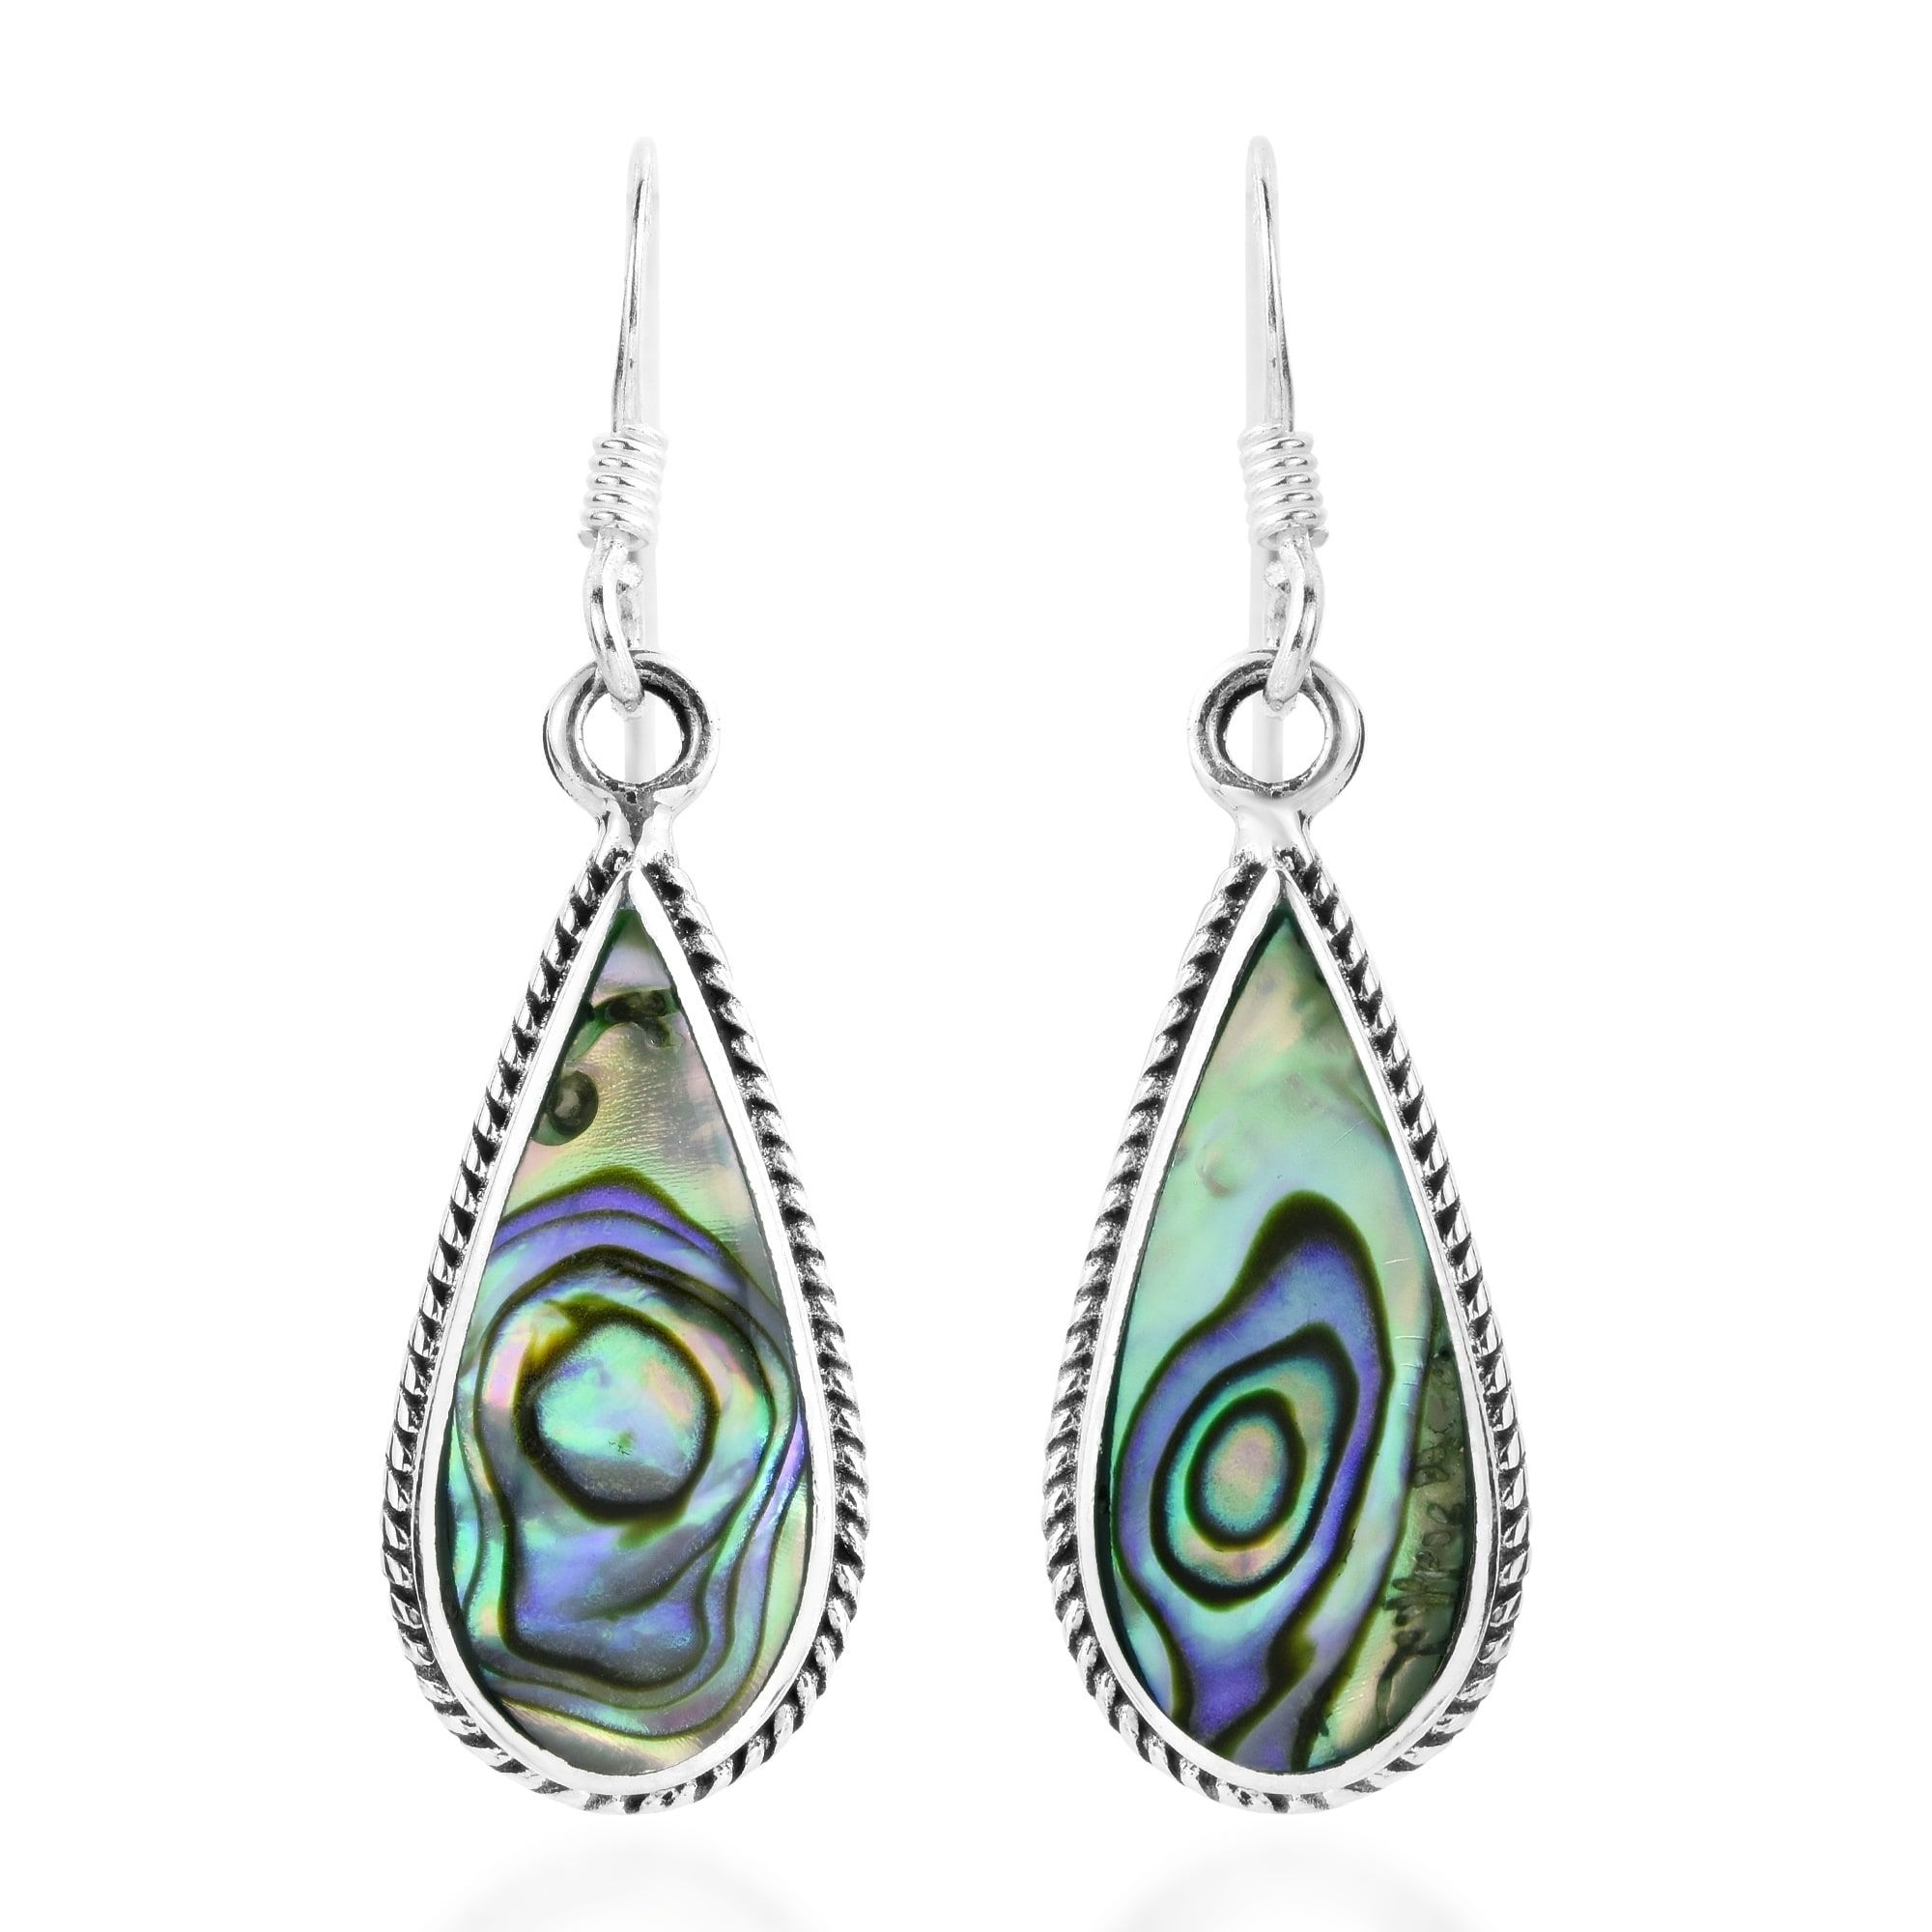 Aeravida Classic Teardrop Shaped Stone Inlaid Sterling Silver Dangle Earrings